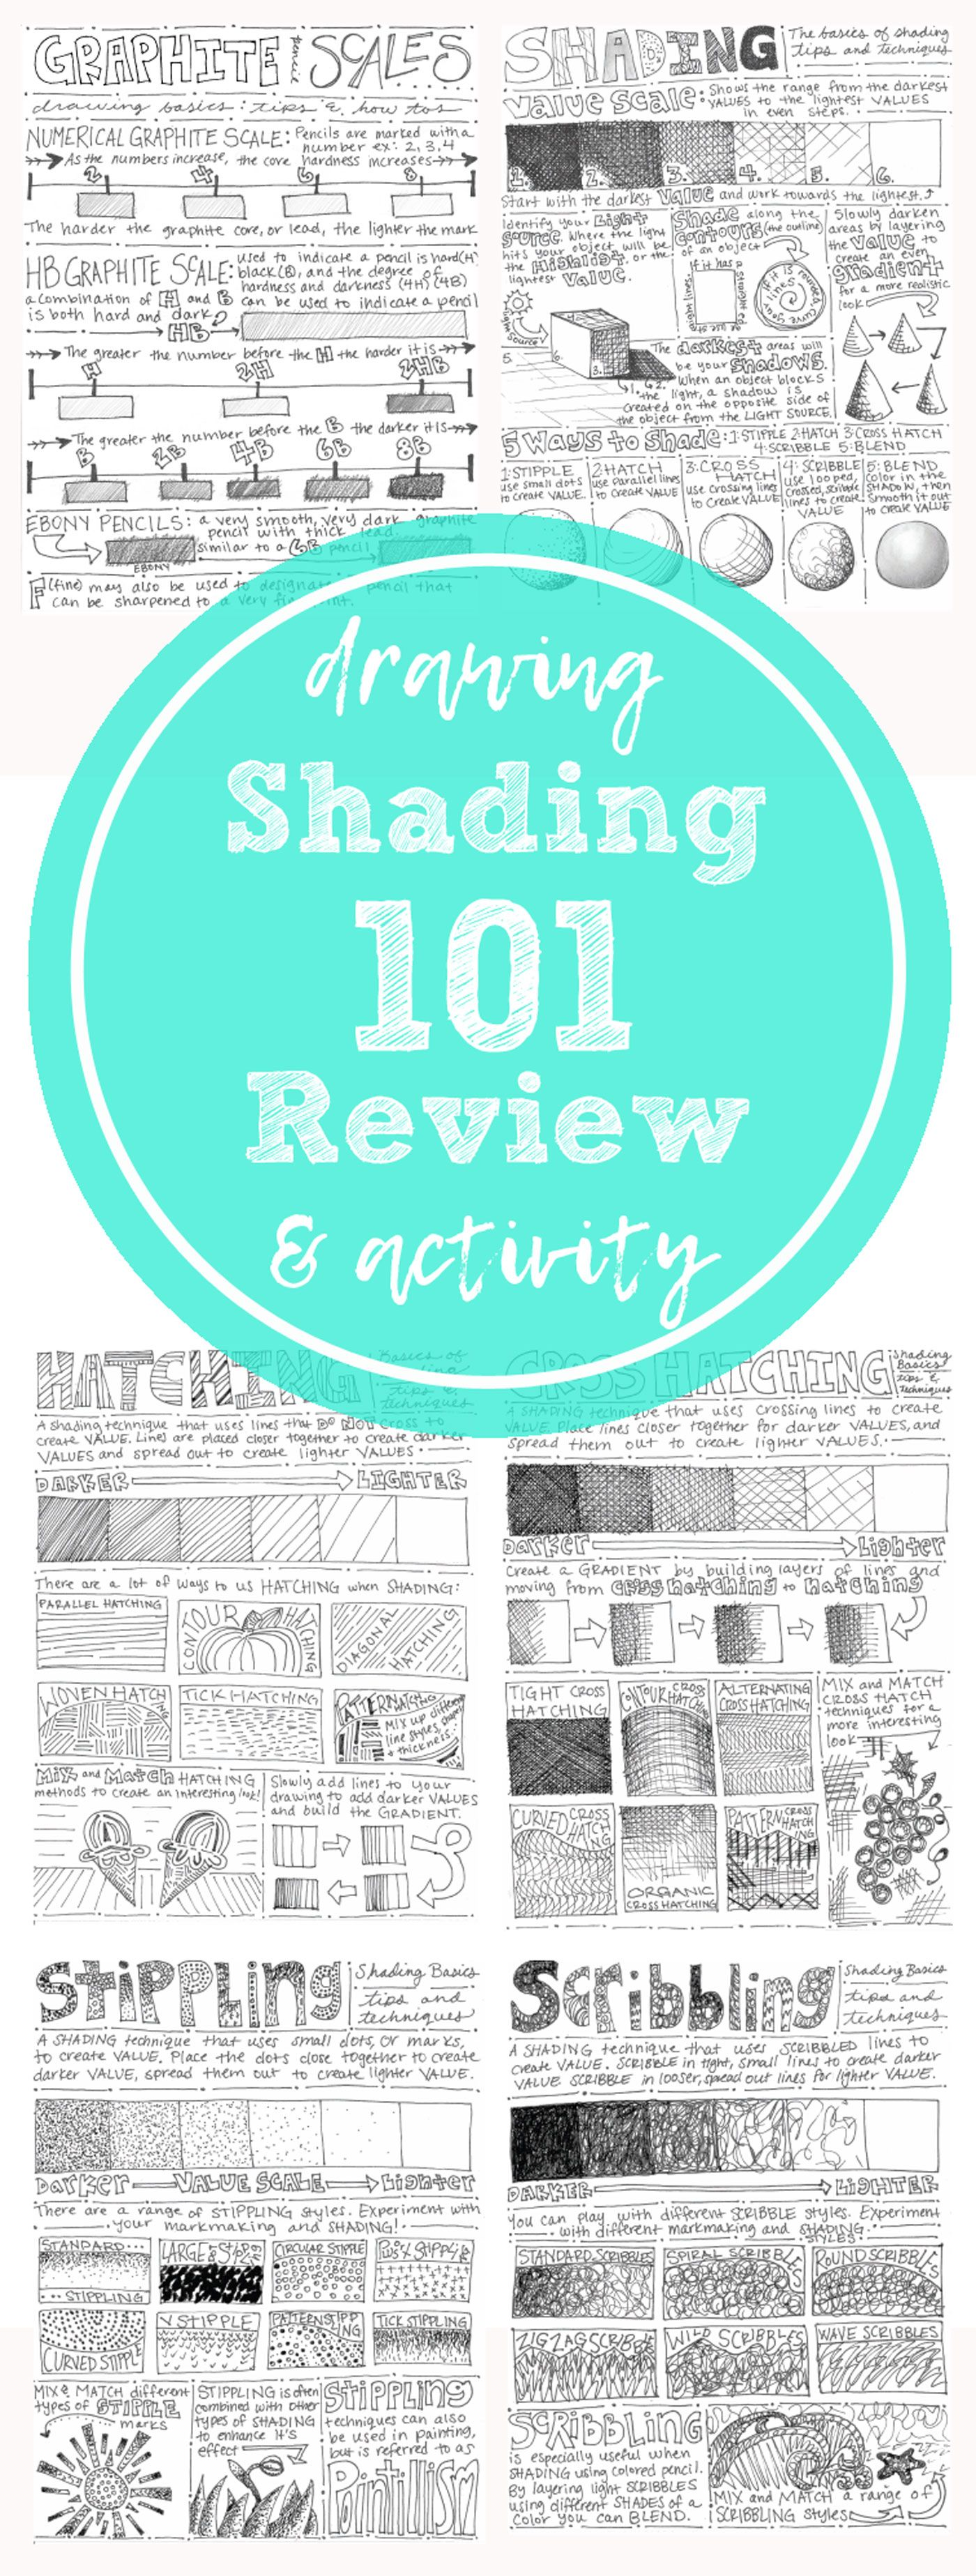 Hatch, Cross Hatch, Stippling, Blending, & Scribbling: Shading ...